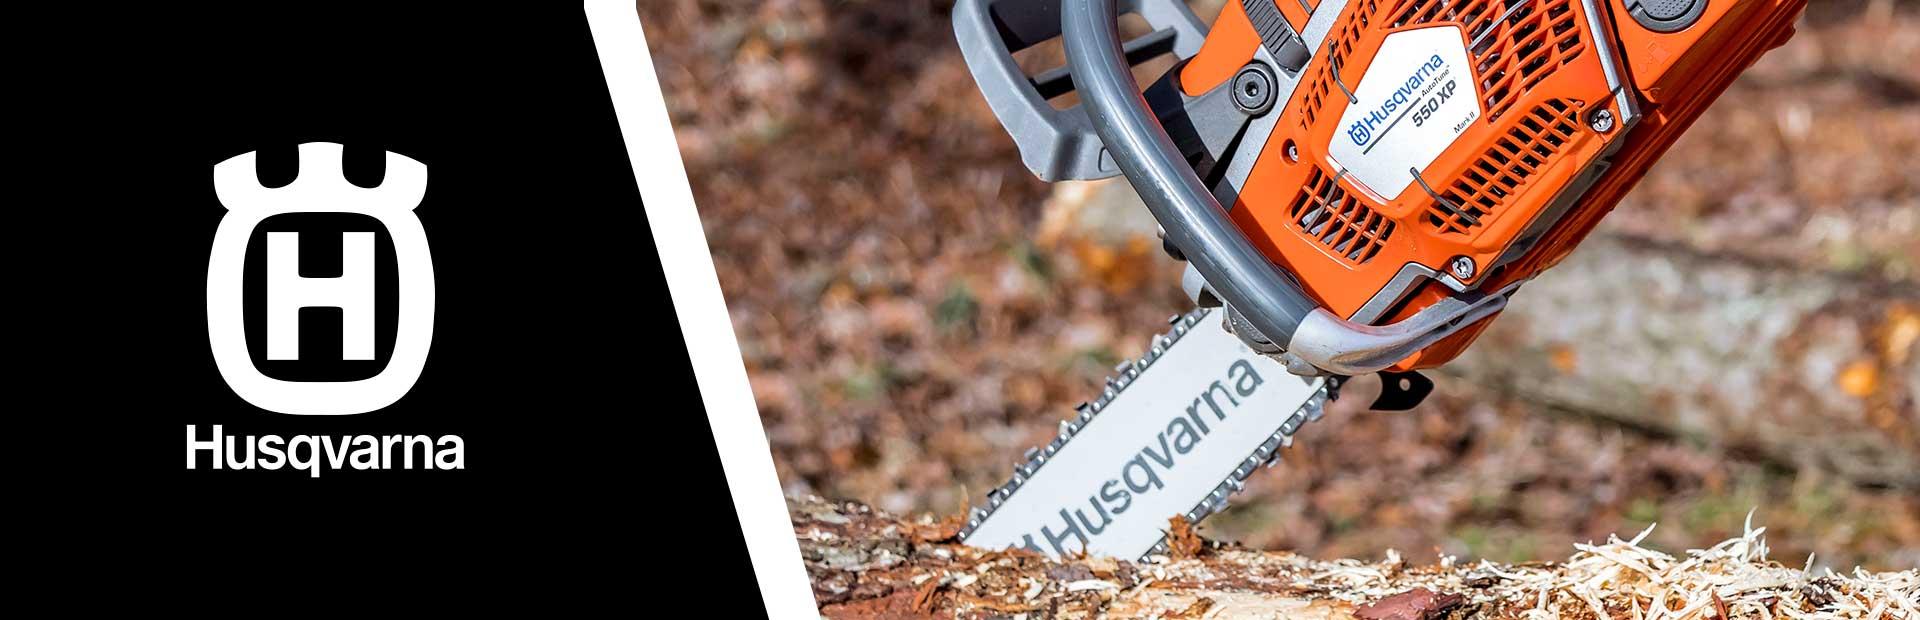 banner-husqvarna-chainsaw-general